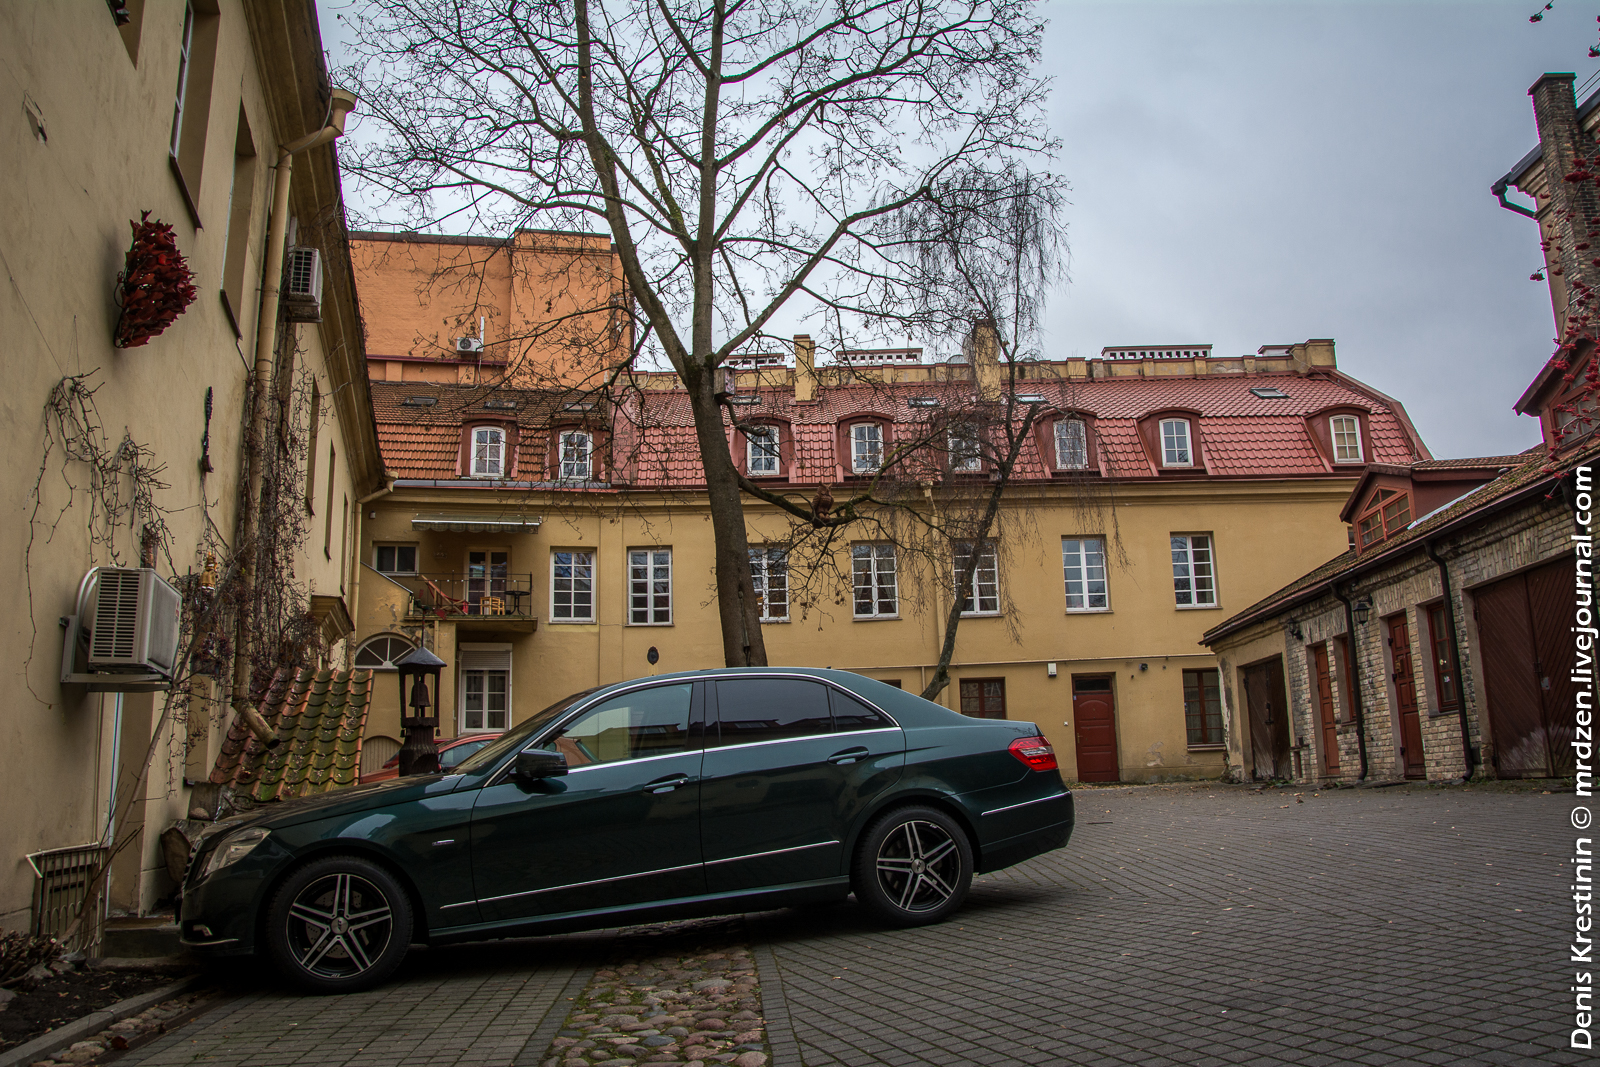 Вильнюс. Дворик в районе старого города.